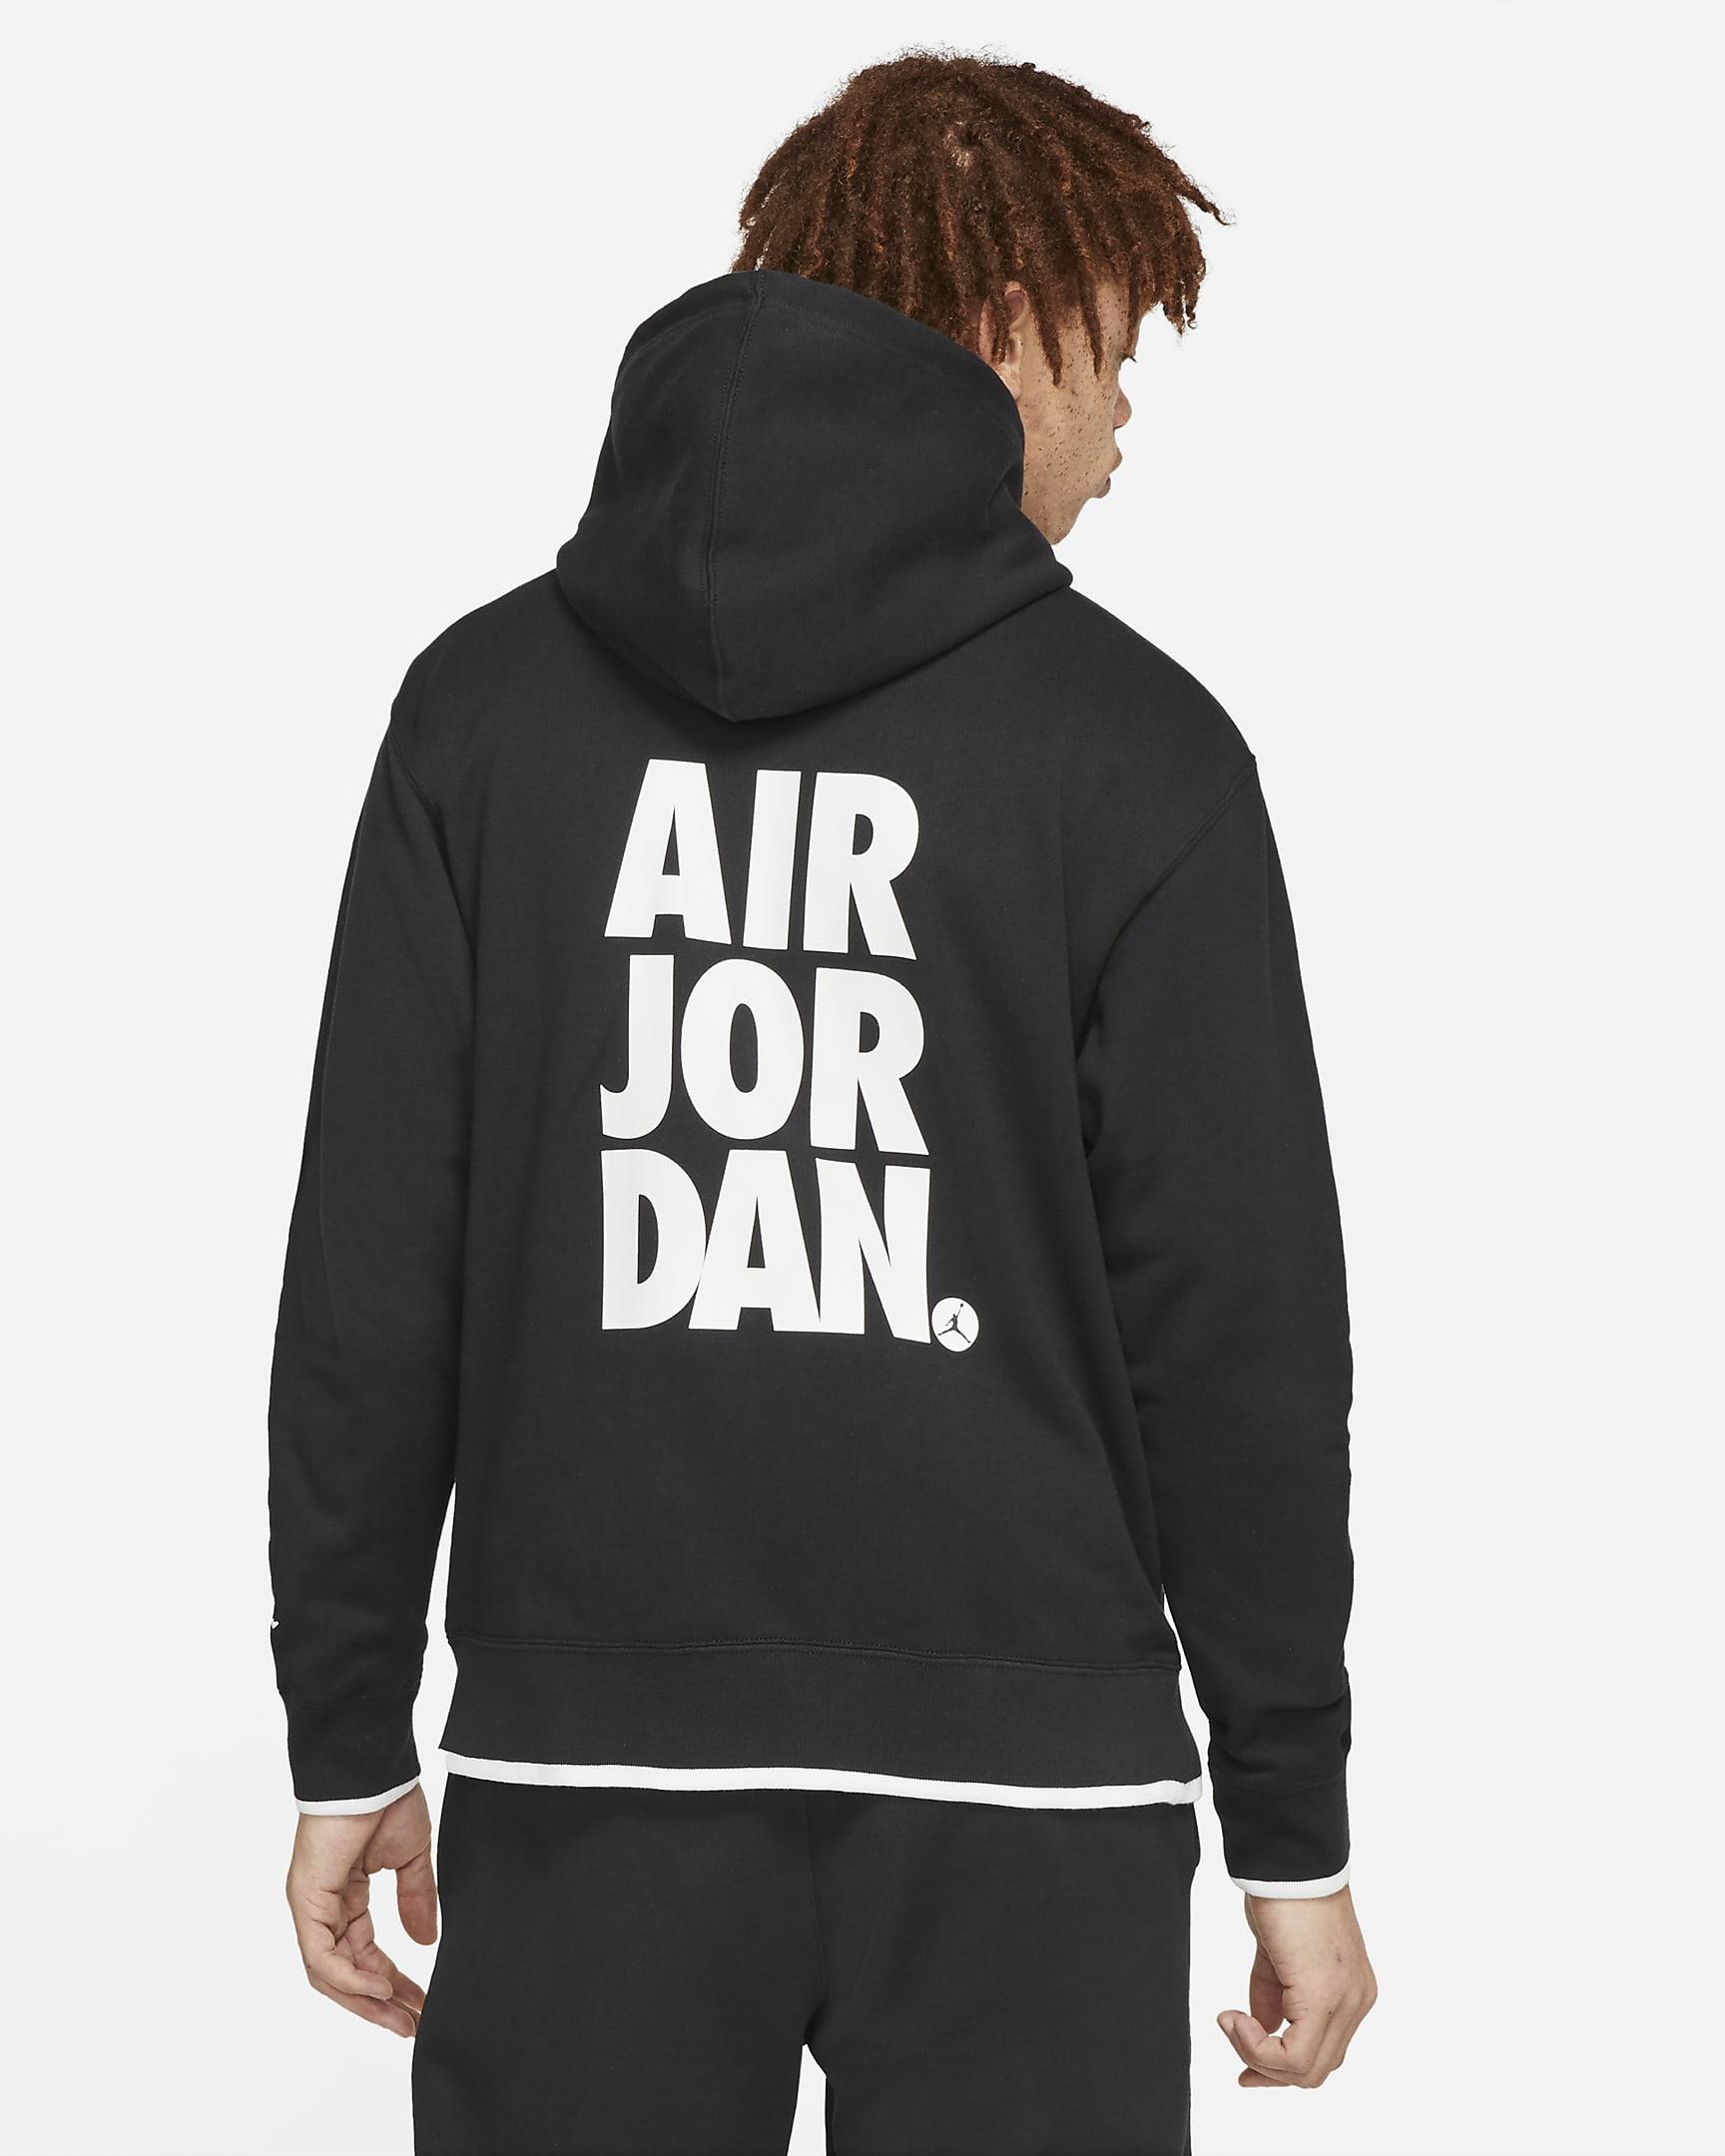 jordan-jumpman-classics-mens-printed-fleece-pullover-hoodie-hz0Q9t-9